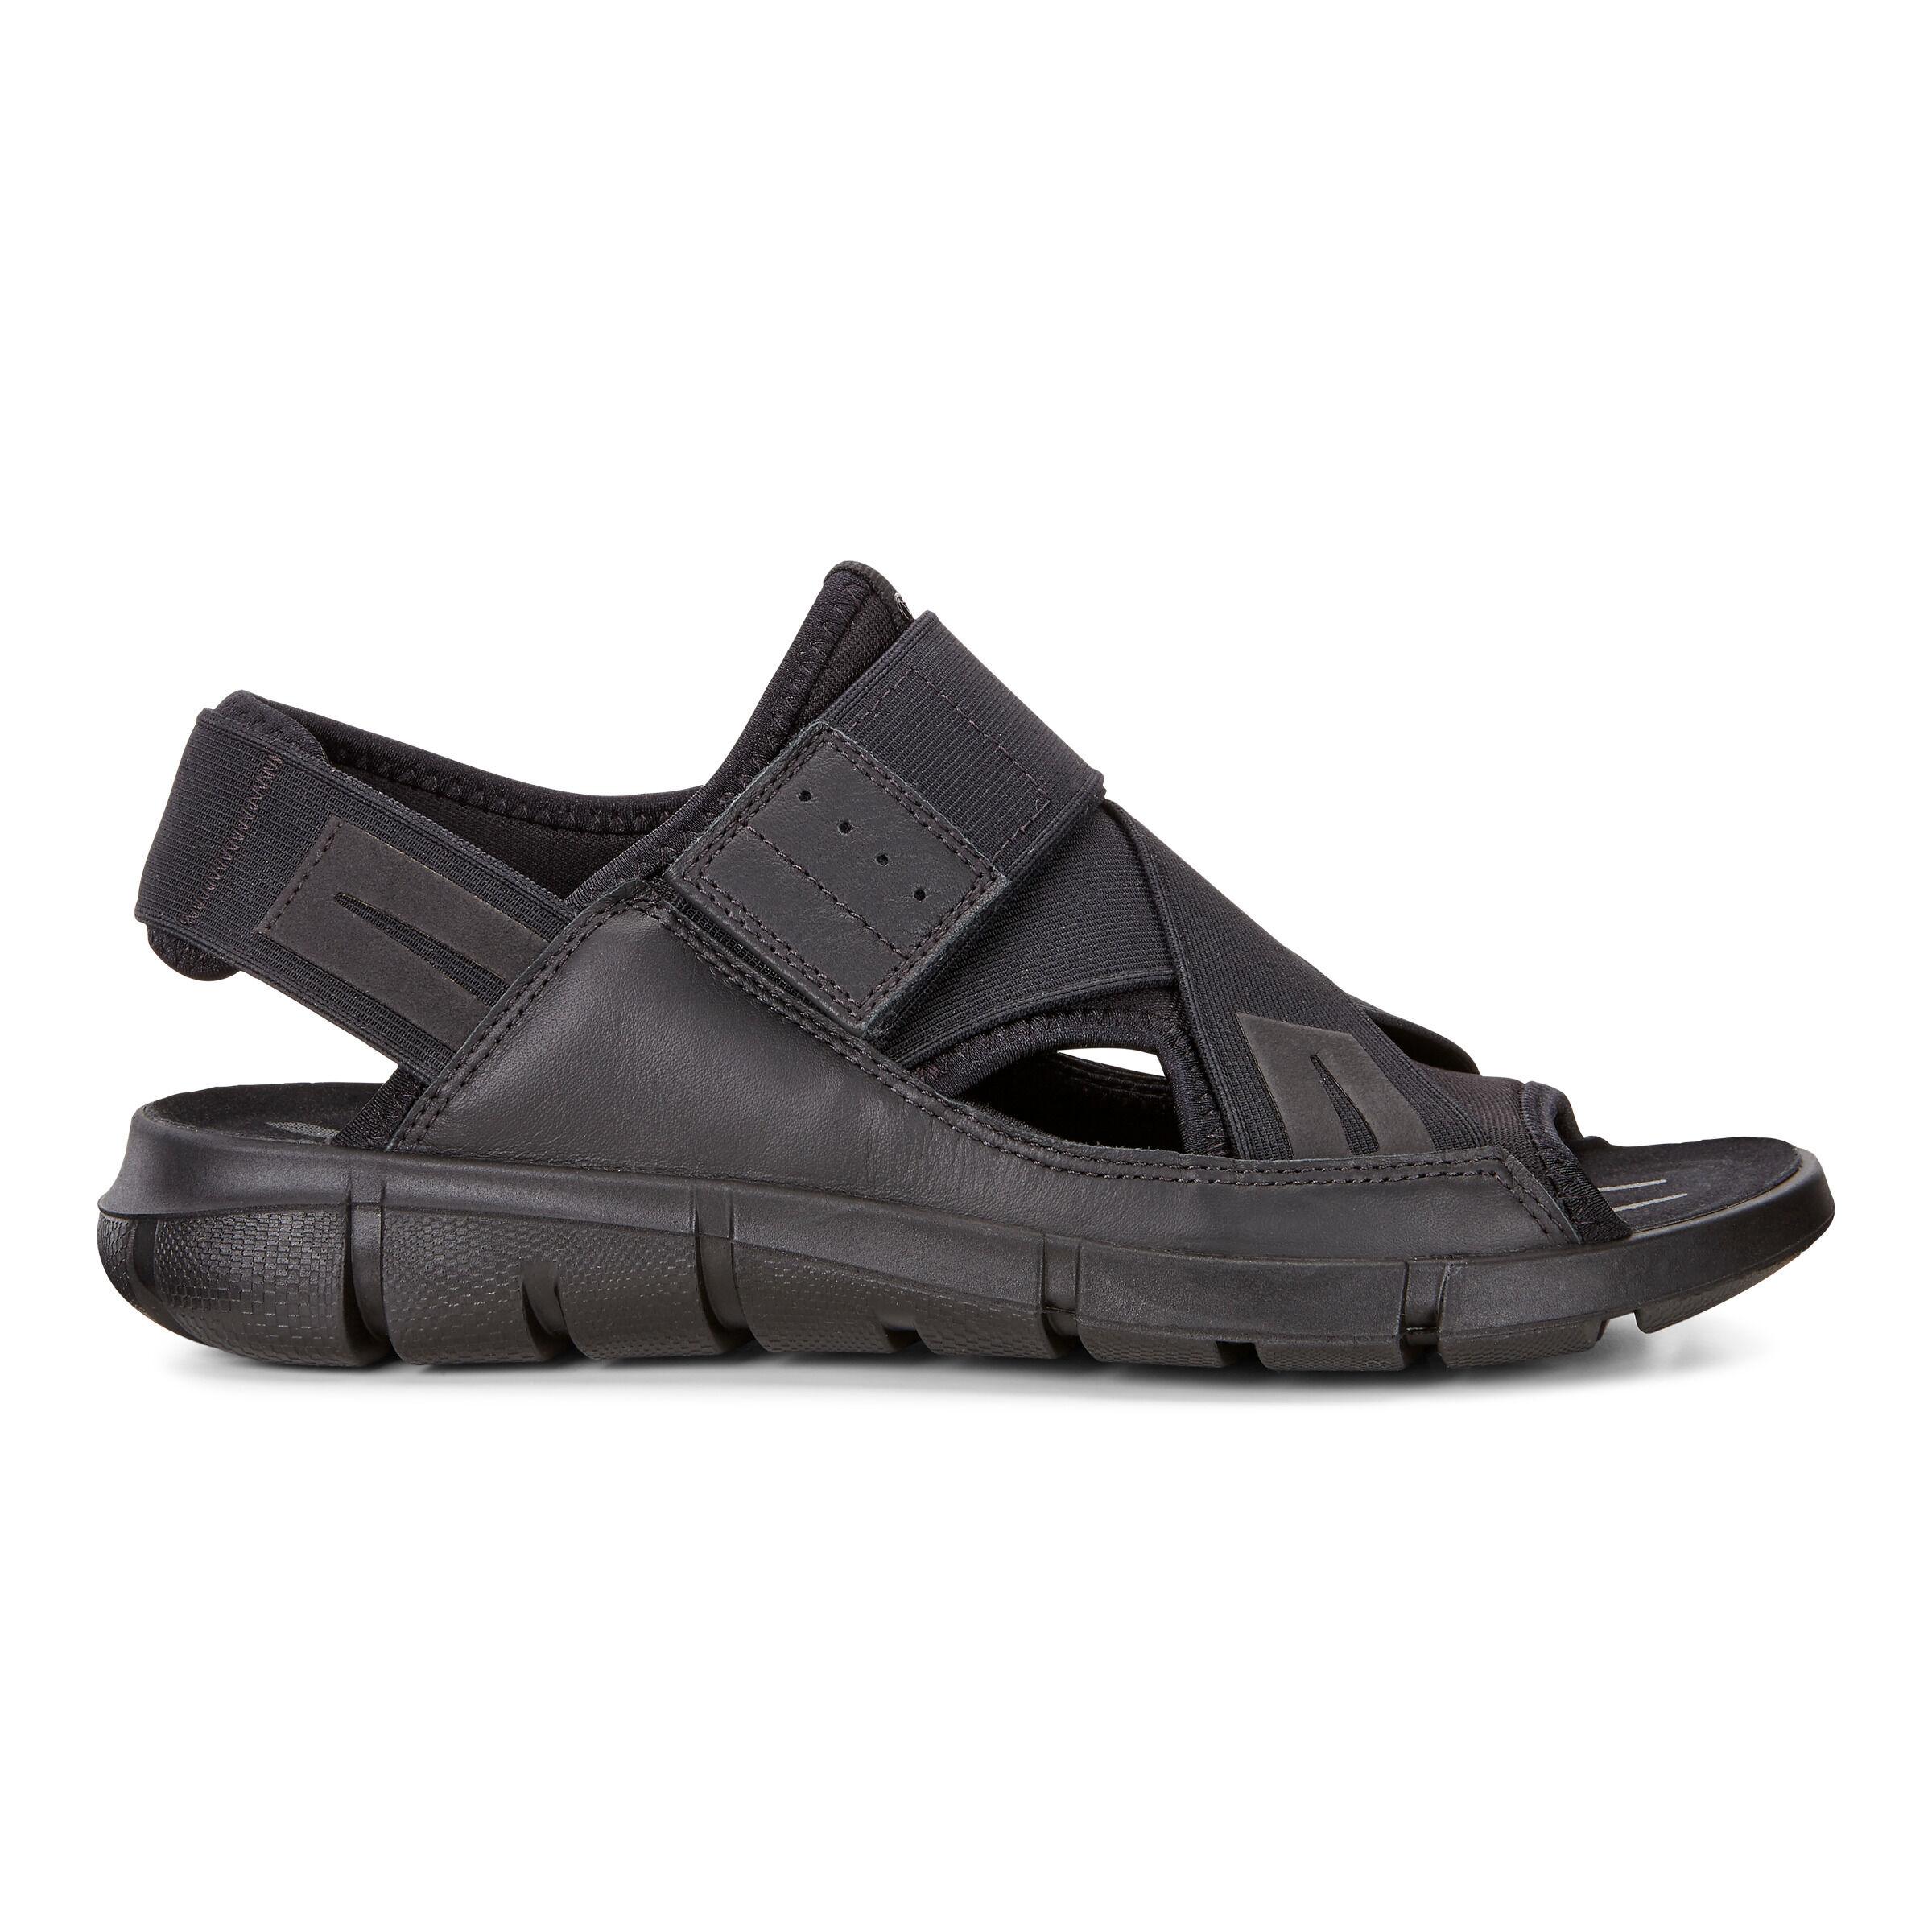 Men's SandalsEcco® Shoes SandalsEcco® Men's Men's Shoes Men's Shoes SandalsEcco® Shoes Men's SandalsEcco® MzpGqSVU